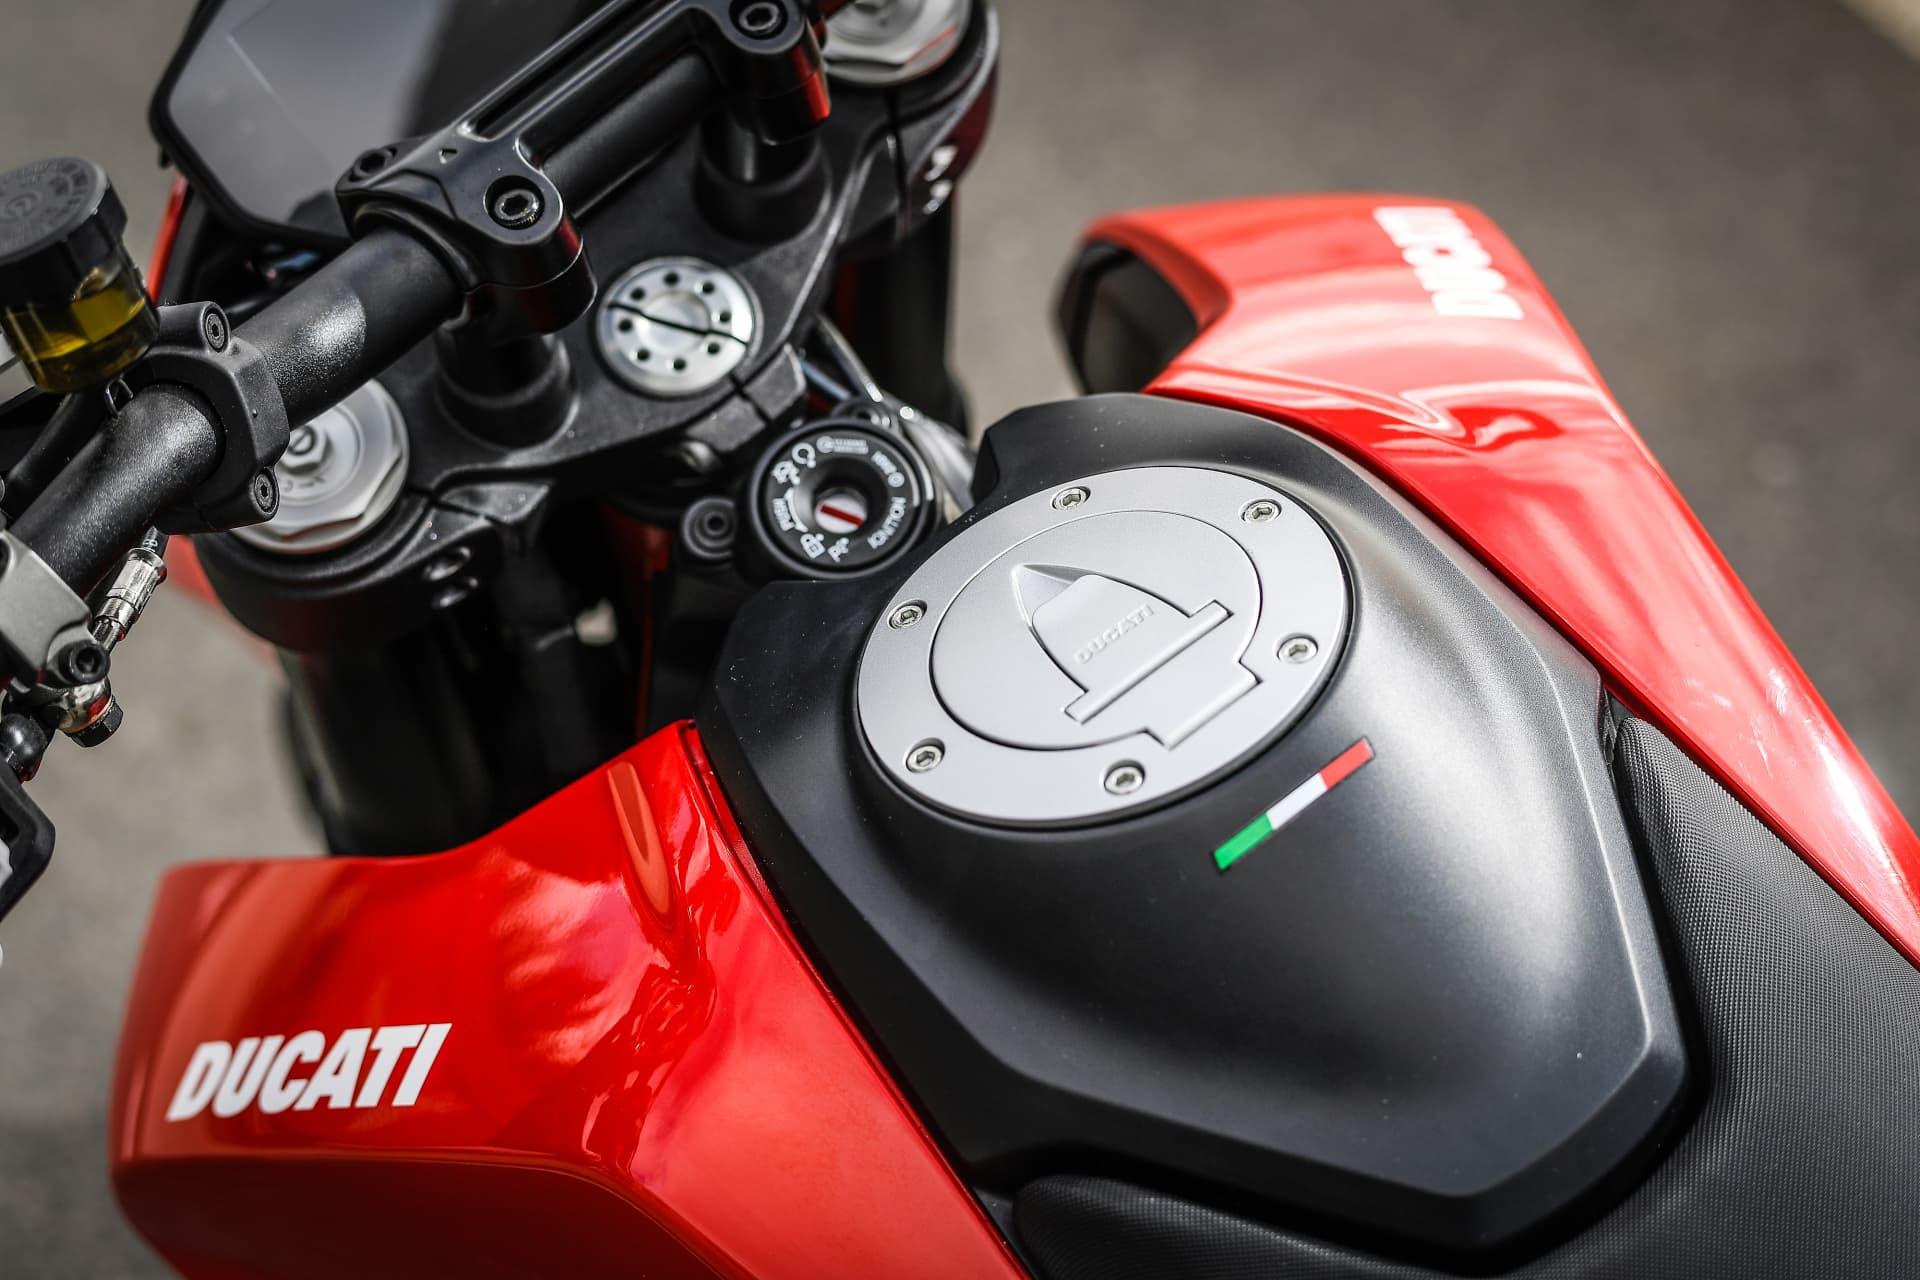 Ducati Hypermotard 950 Static 21 Uc70285 Mid